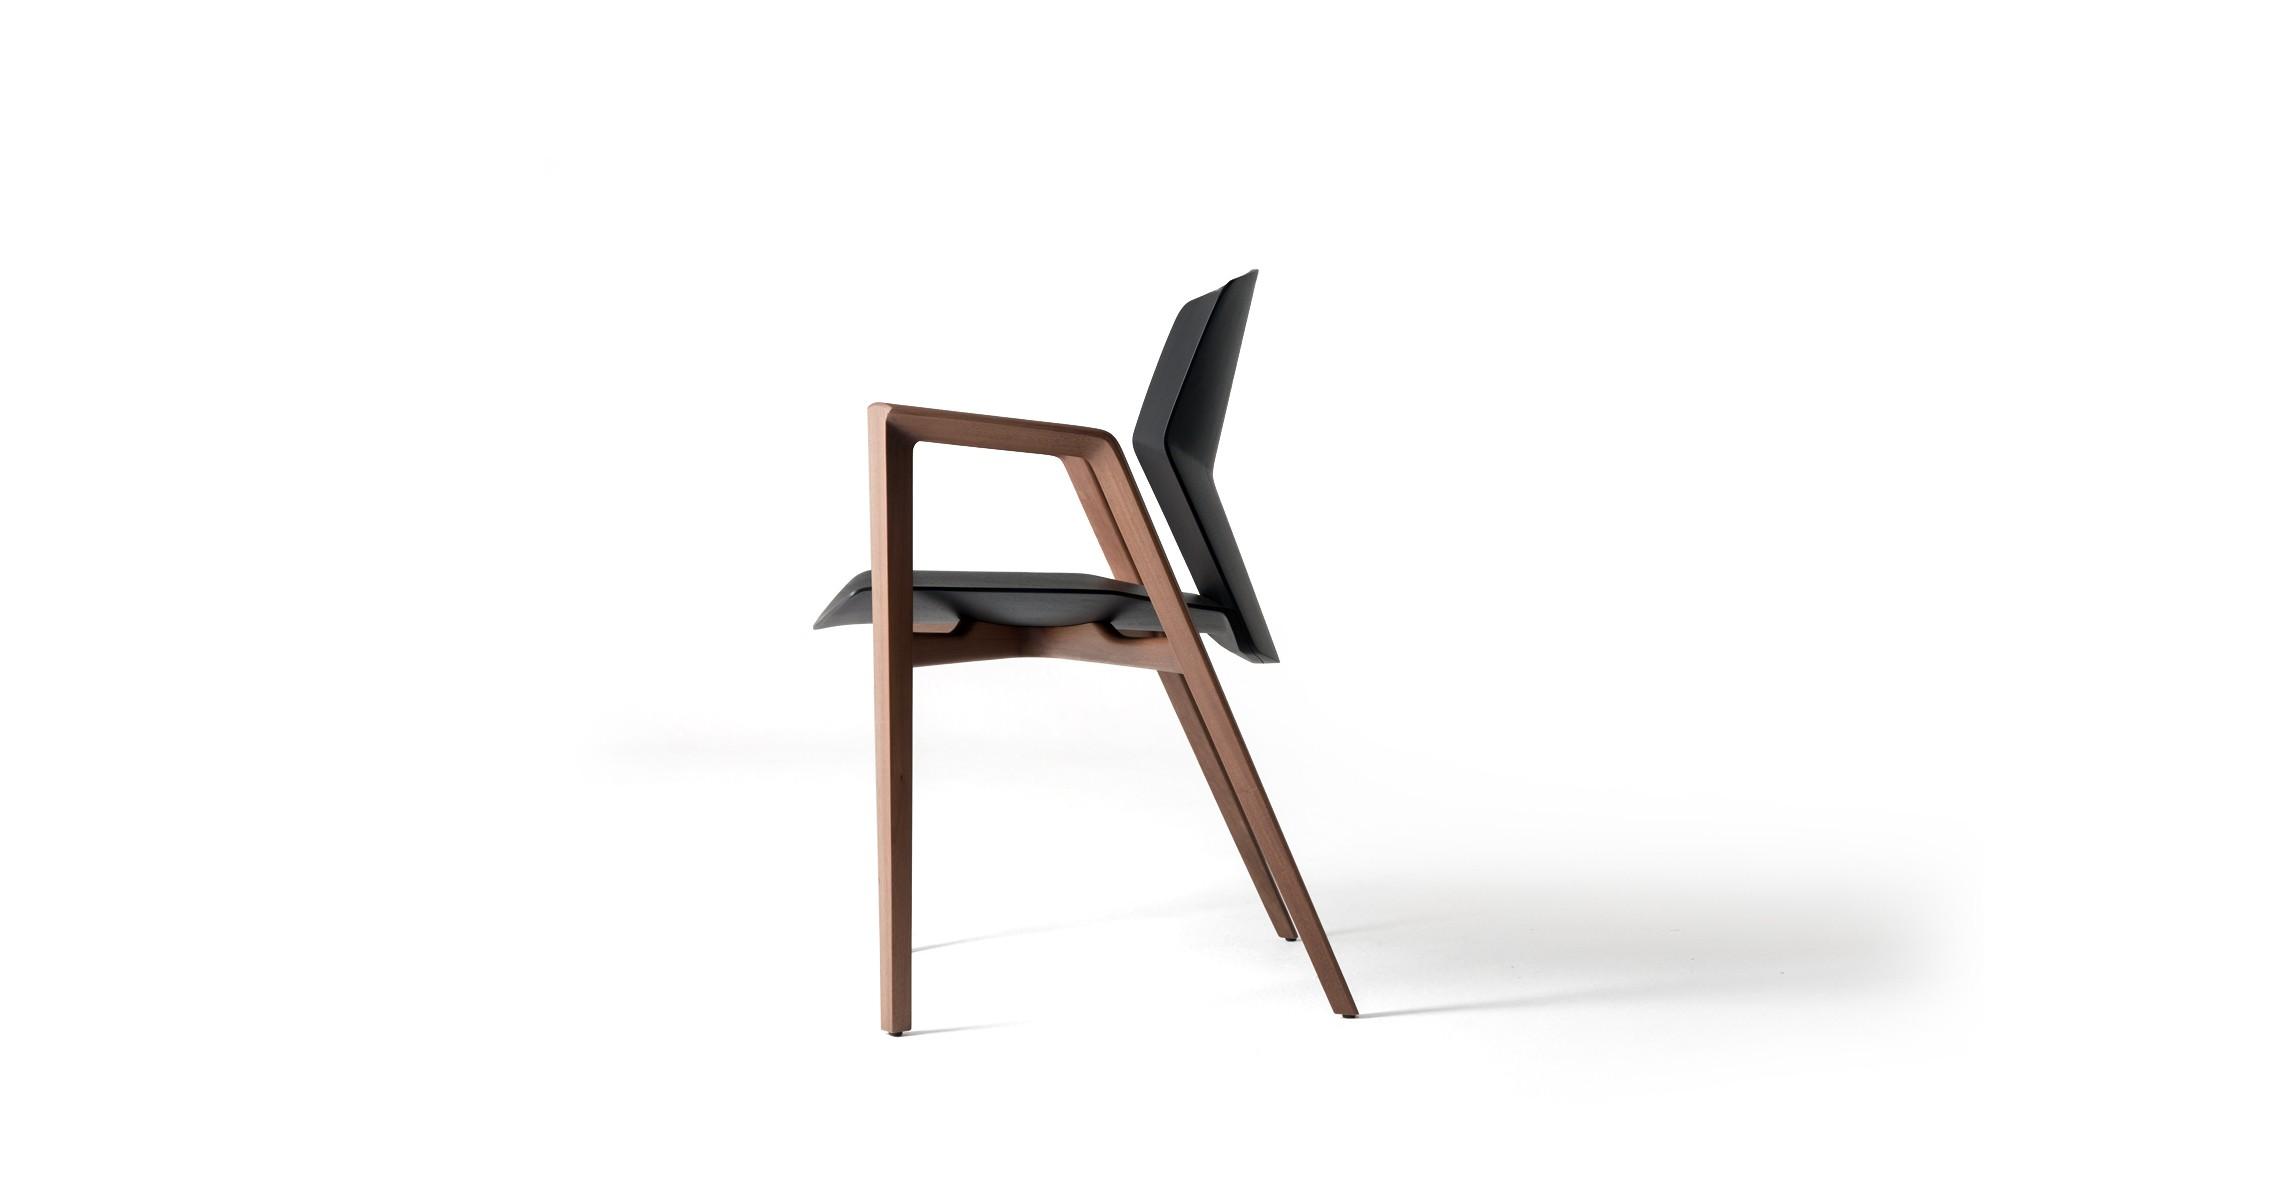 [Cadeira Zora] Fullbanner 1